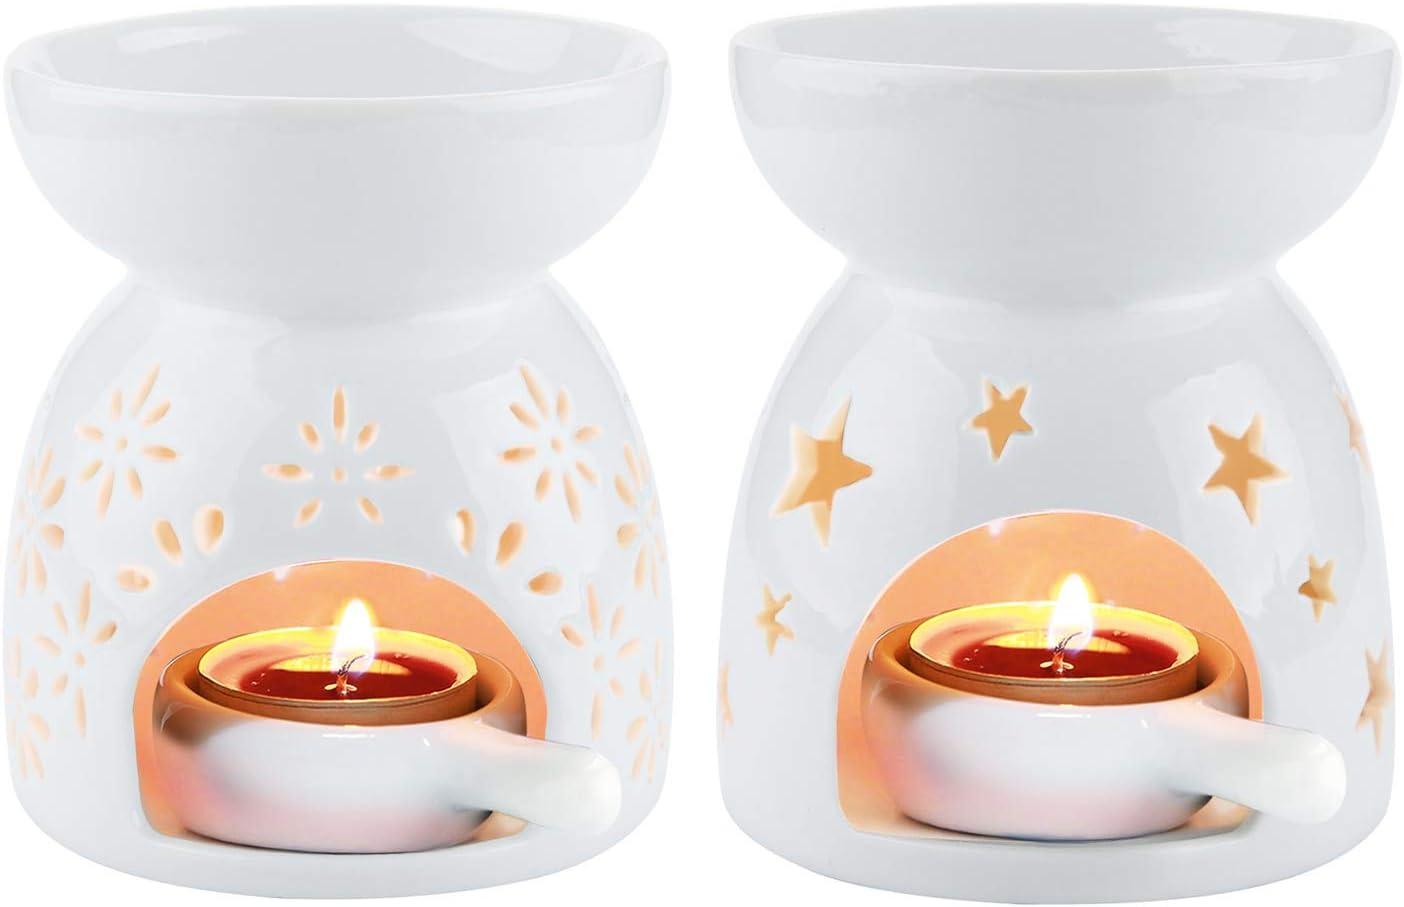 Comsaf Ceramic Tealight Candle Holder Oil Burner Essential Oil Incense Aroma Diffuser Furnace Home Decoration Romantic White Set Of 2 Home Kitchen